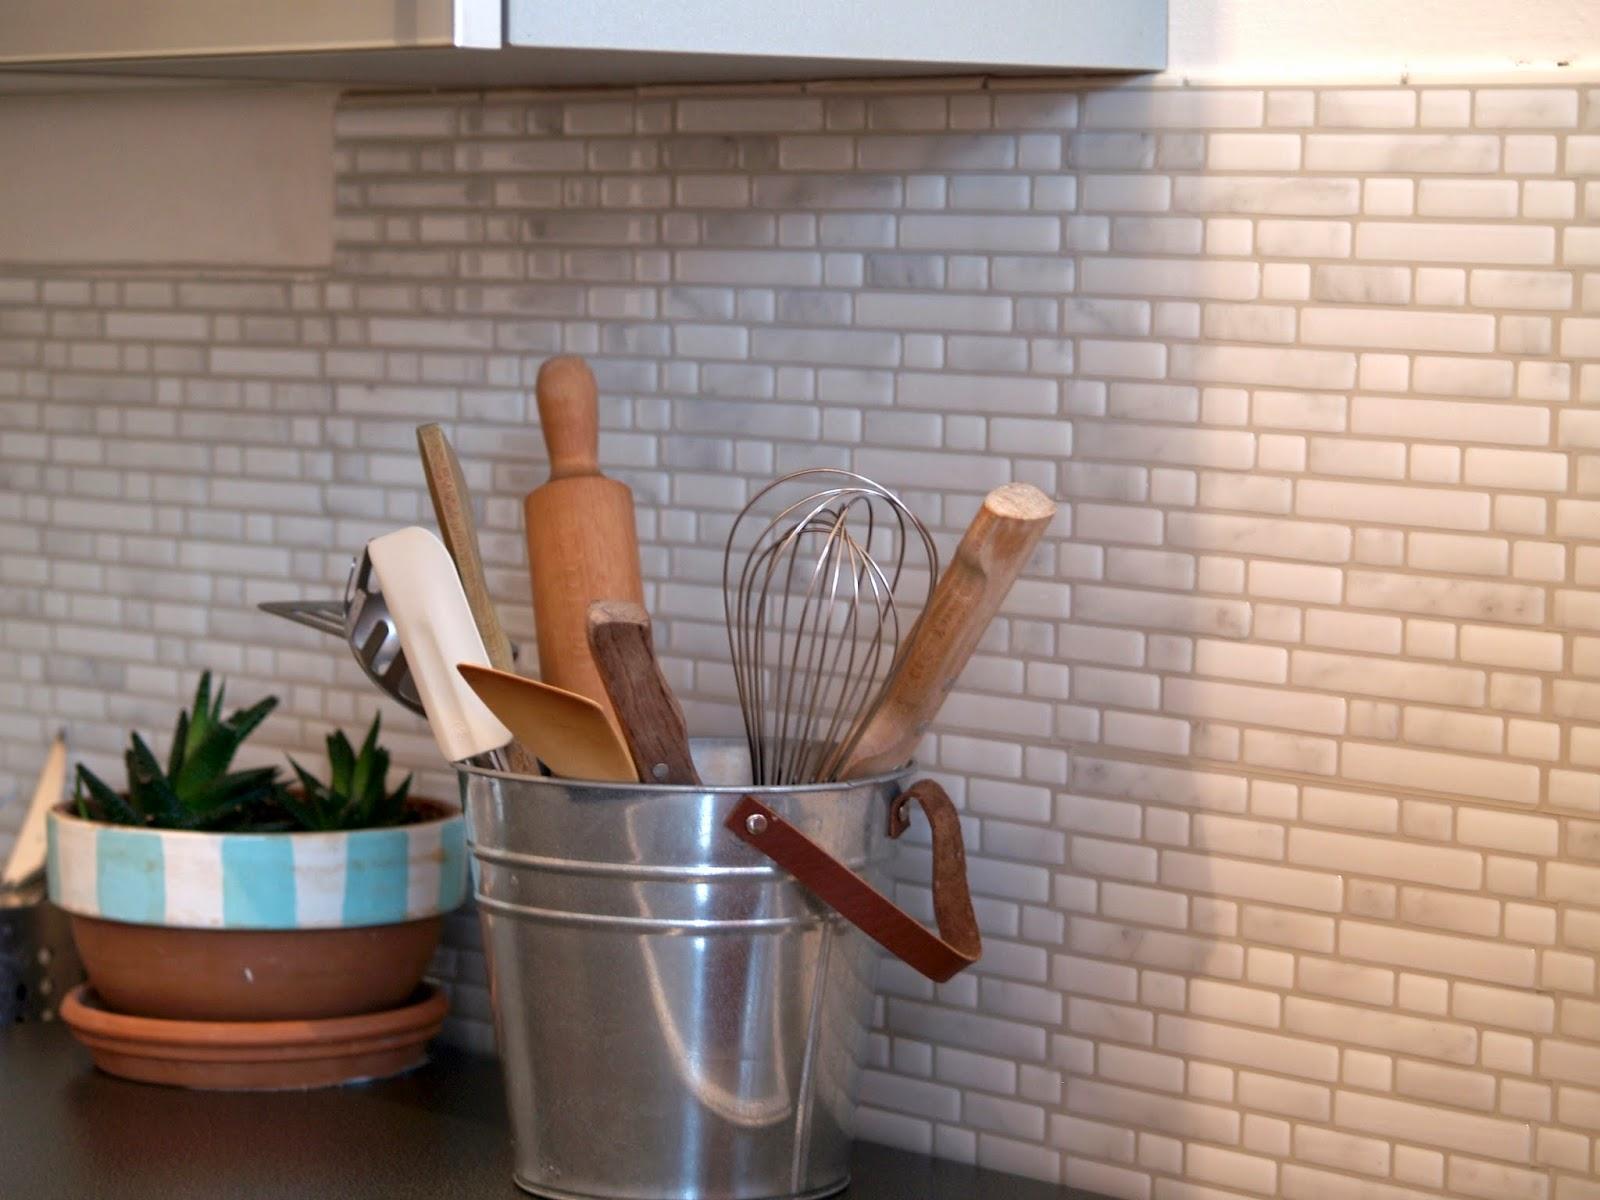 J Ai Teste Le Carrelage Mural Adhesif Smart Tiles Valy S Blog